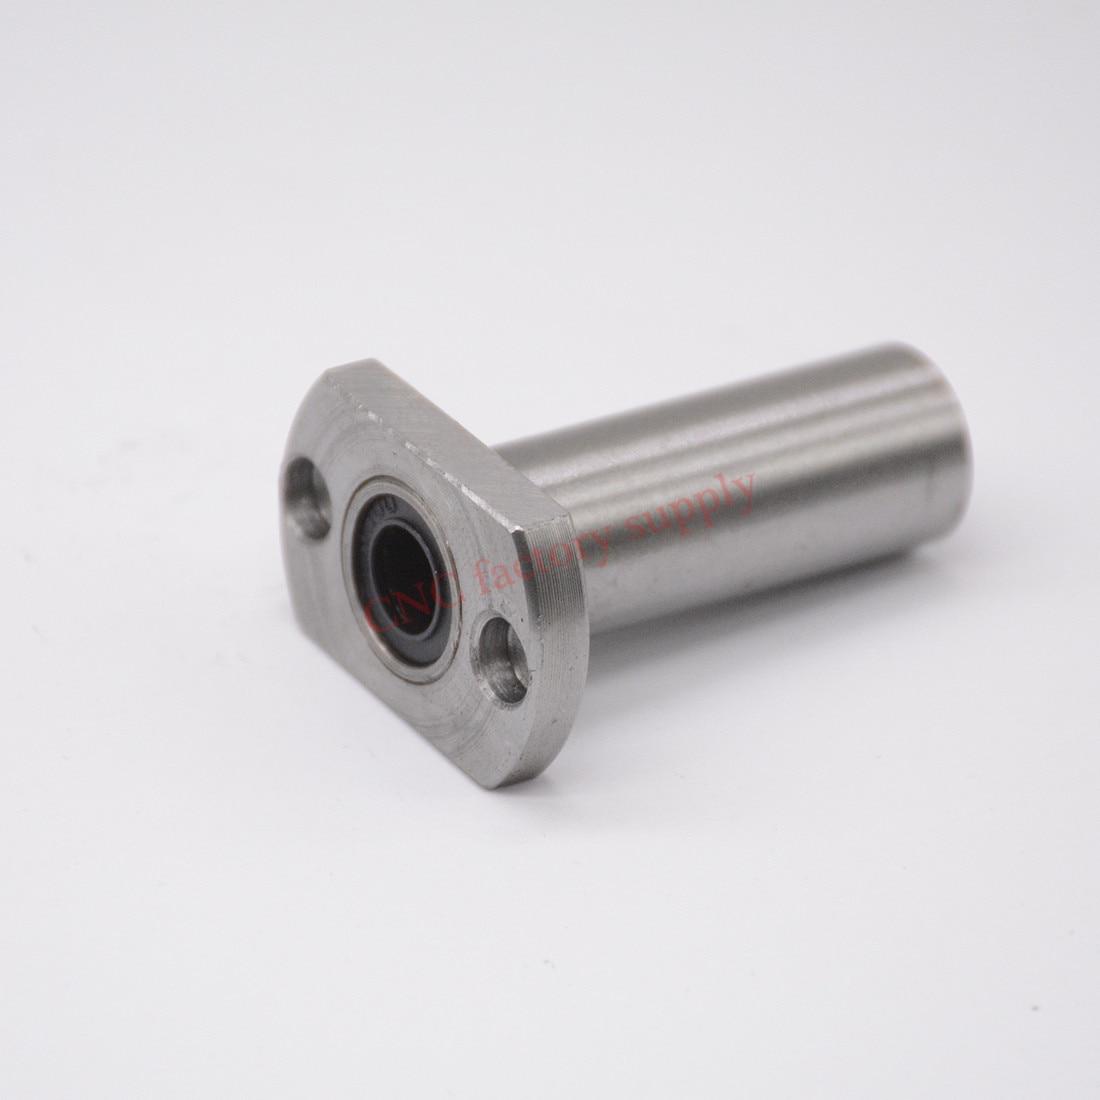 Hot sale 1 pc LMH6LUU 6mm long type flange linear bearing CNC Linear Bush hot sale cayler